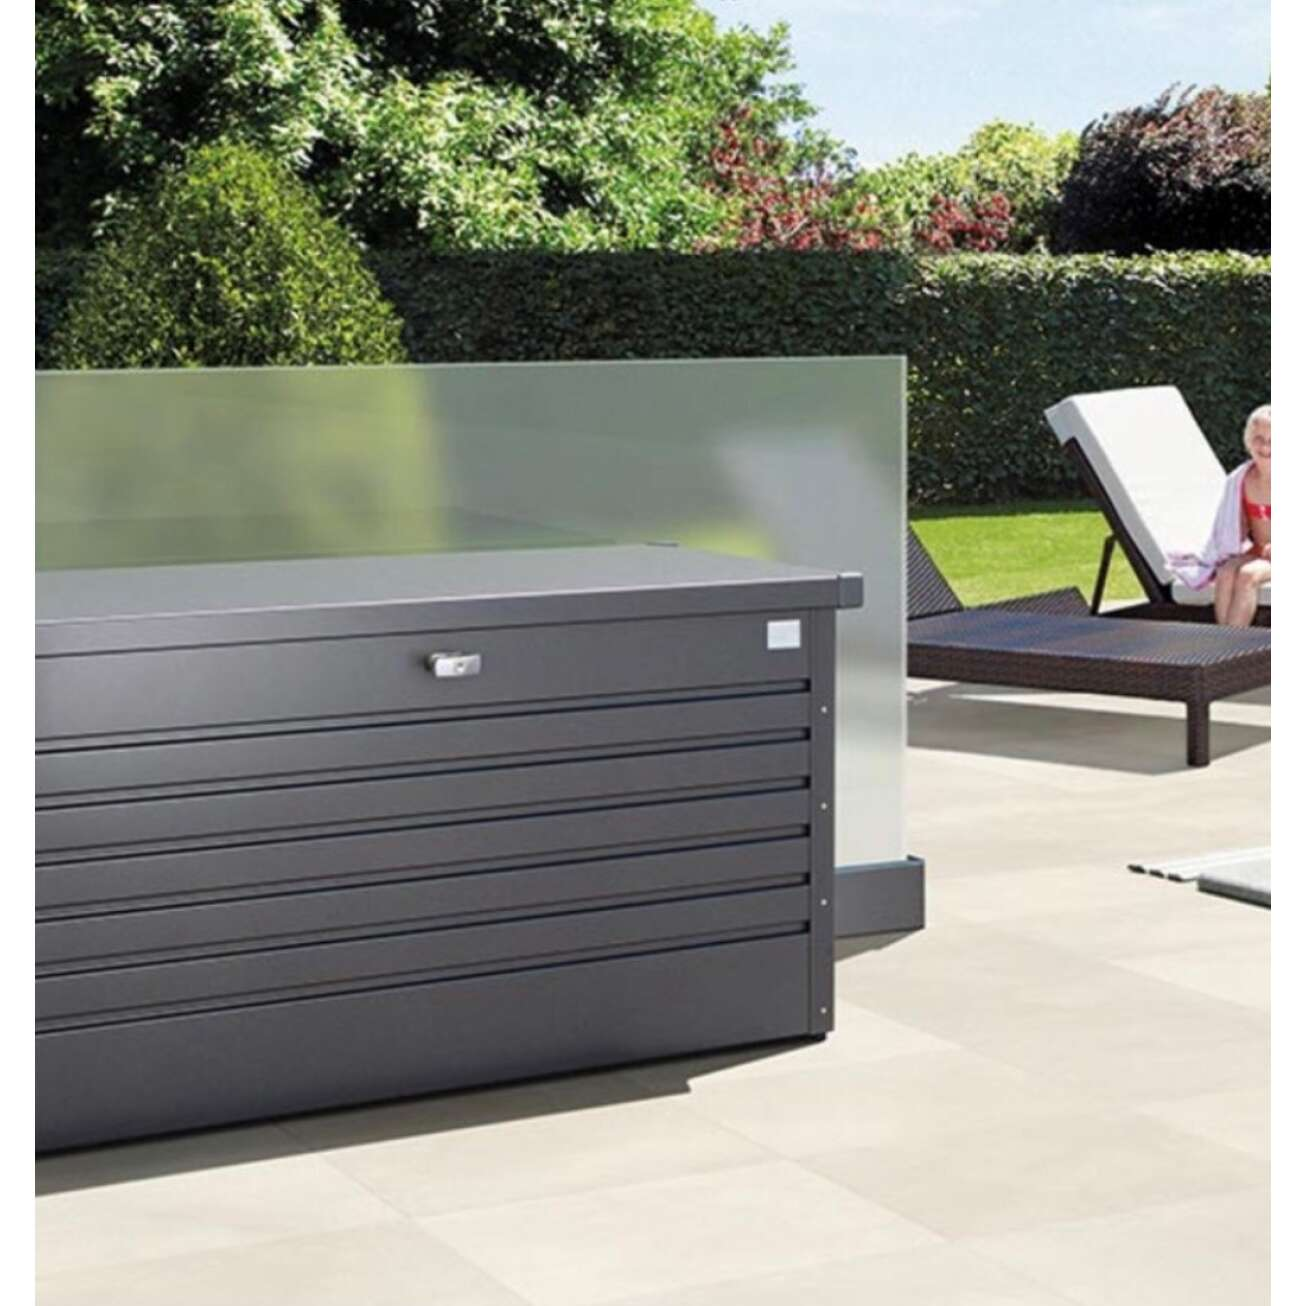 Leisurebox Biohort Fine Design